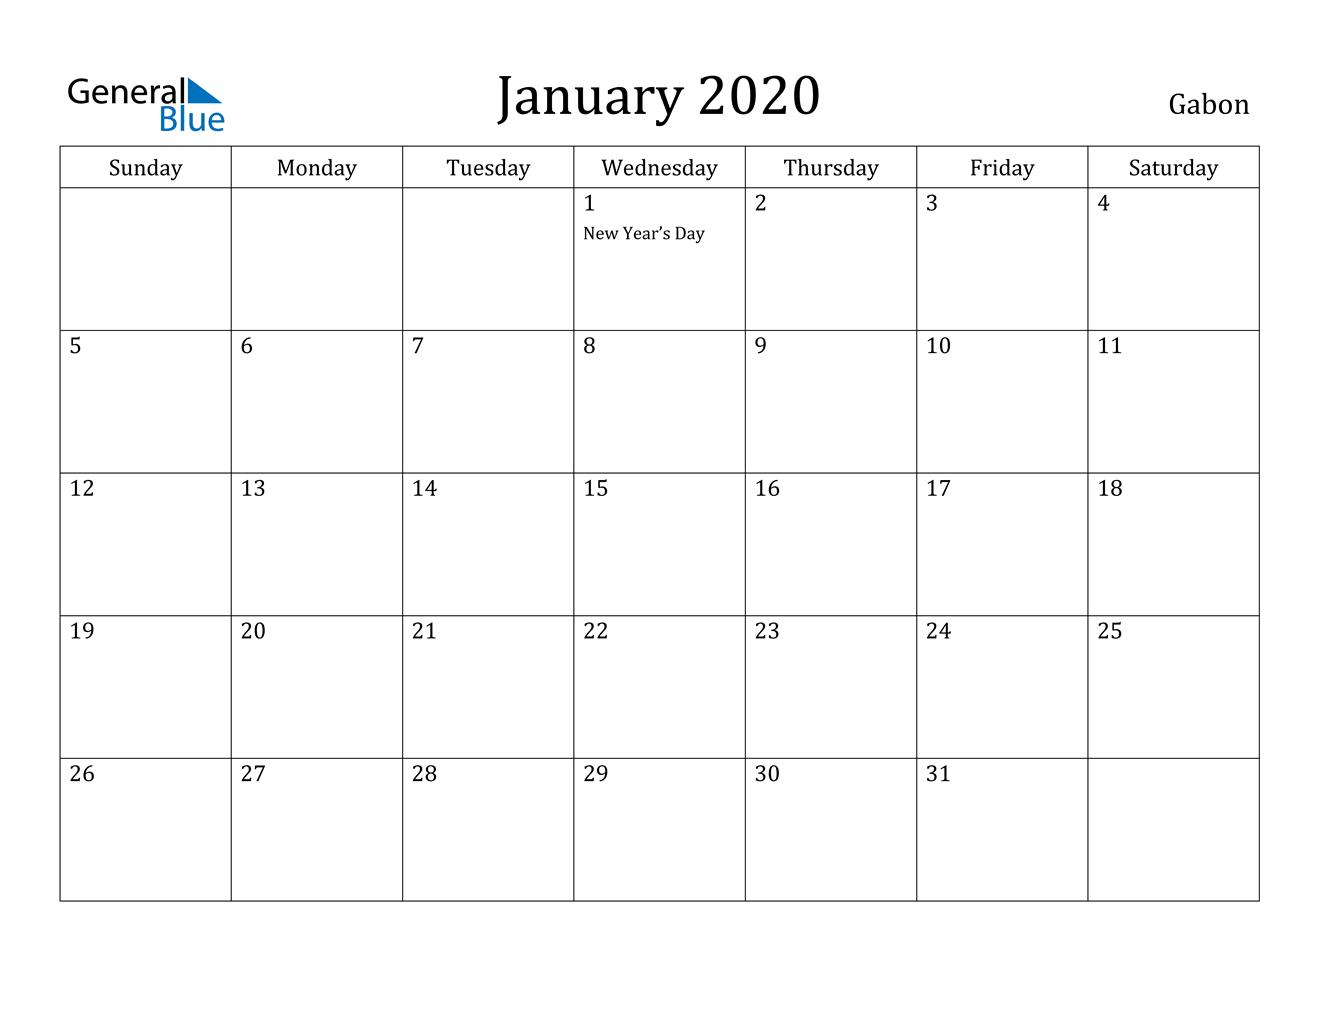 Image of January 2020 Gabon Calendar with Holidays Calendar